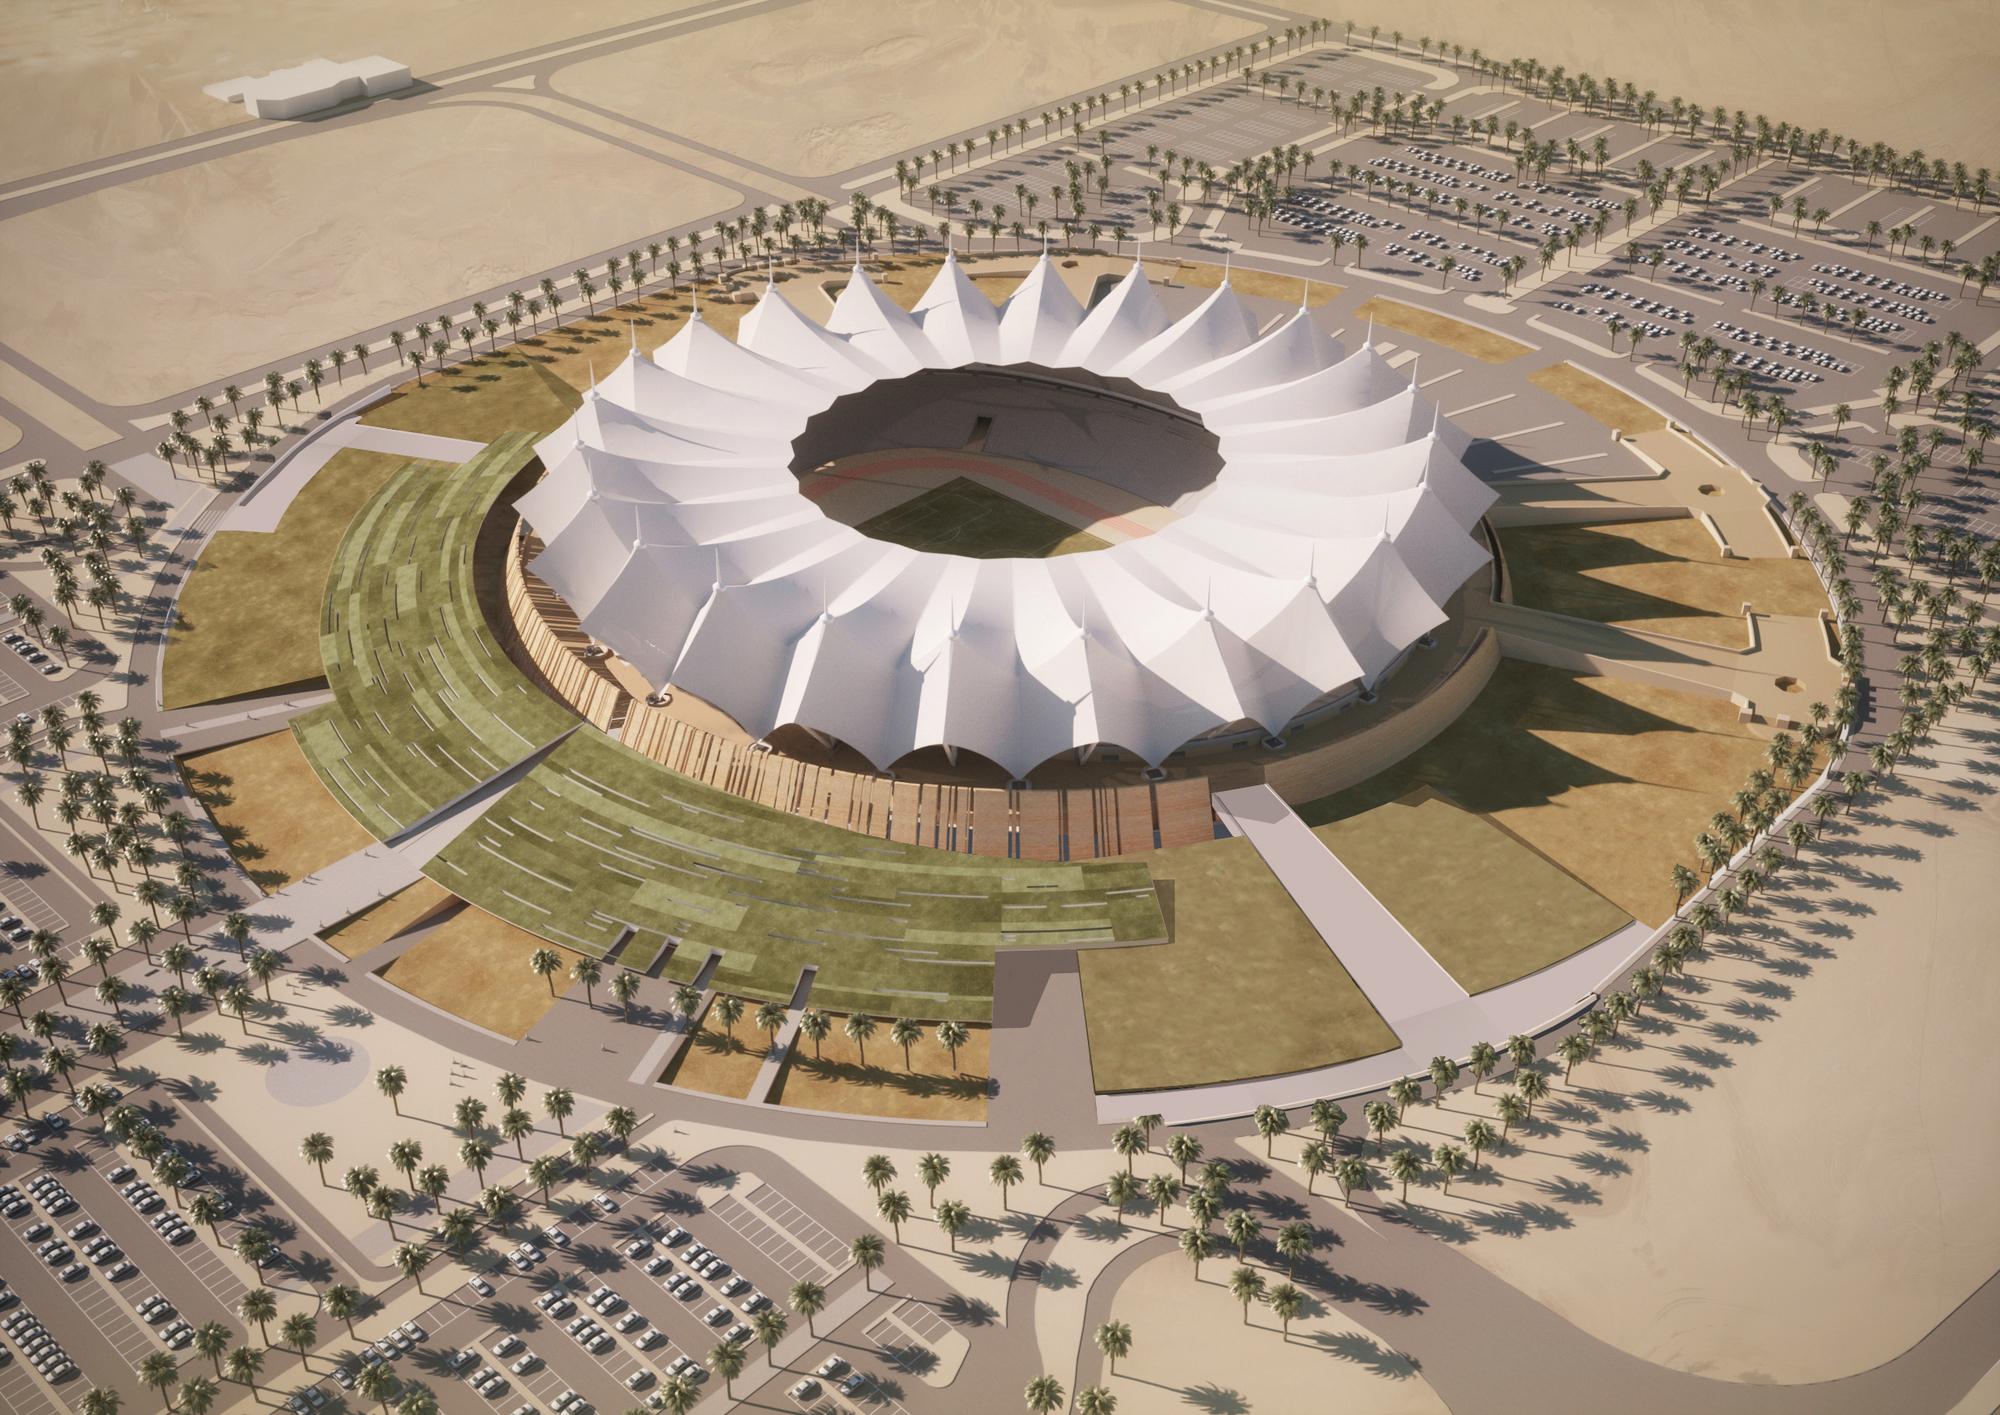 Schiattarella Associati Unveils Riyadh Stadium Plans